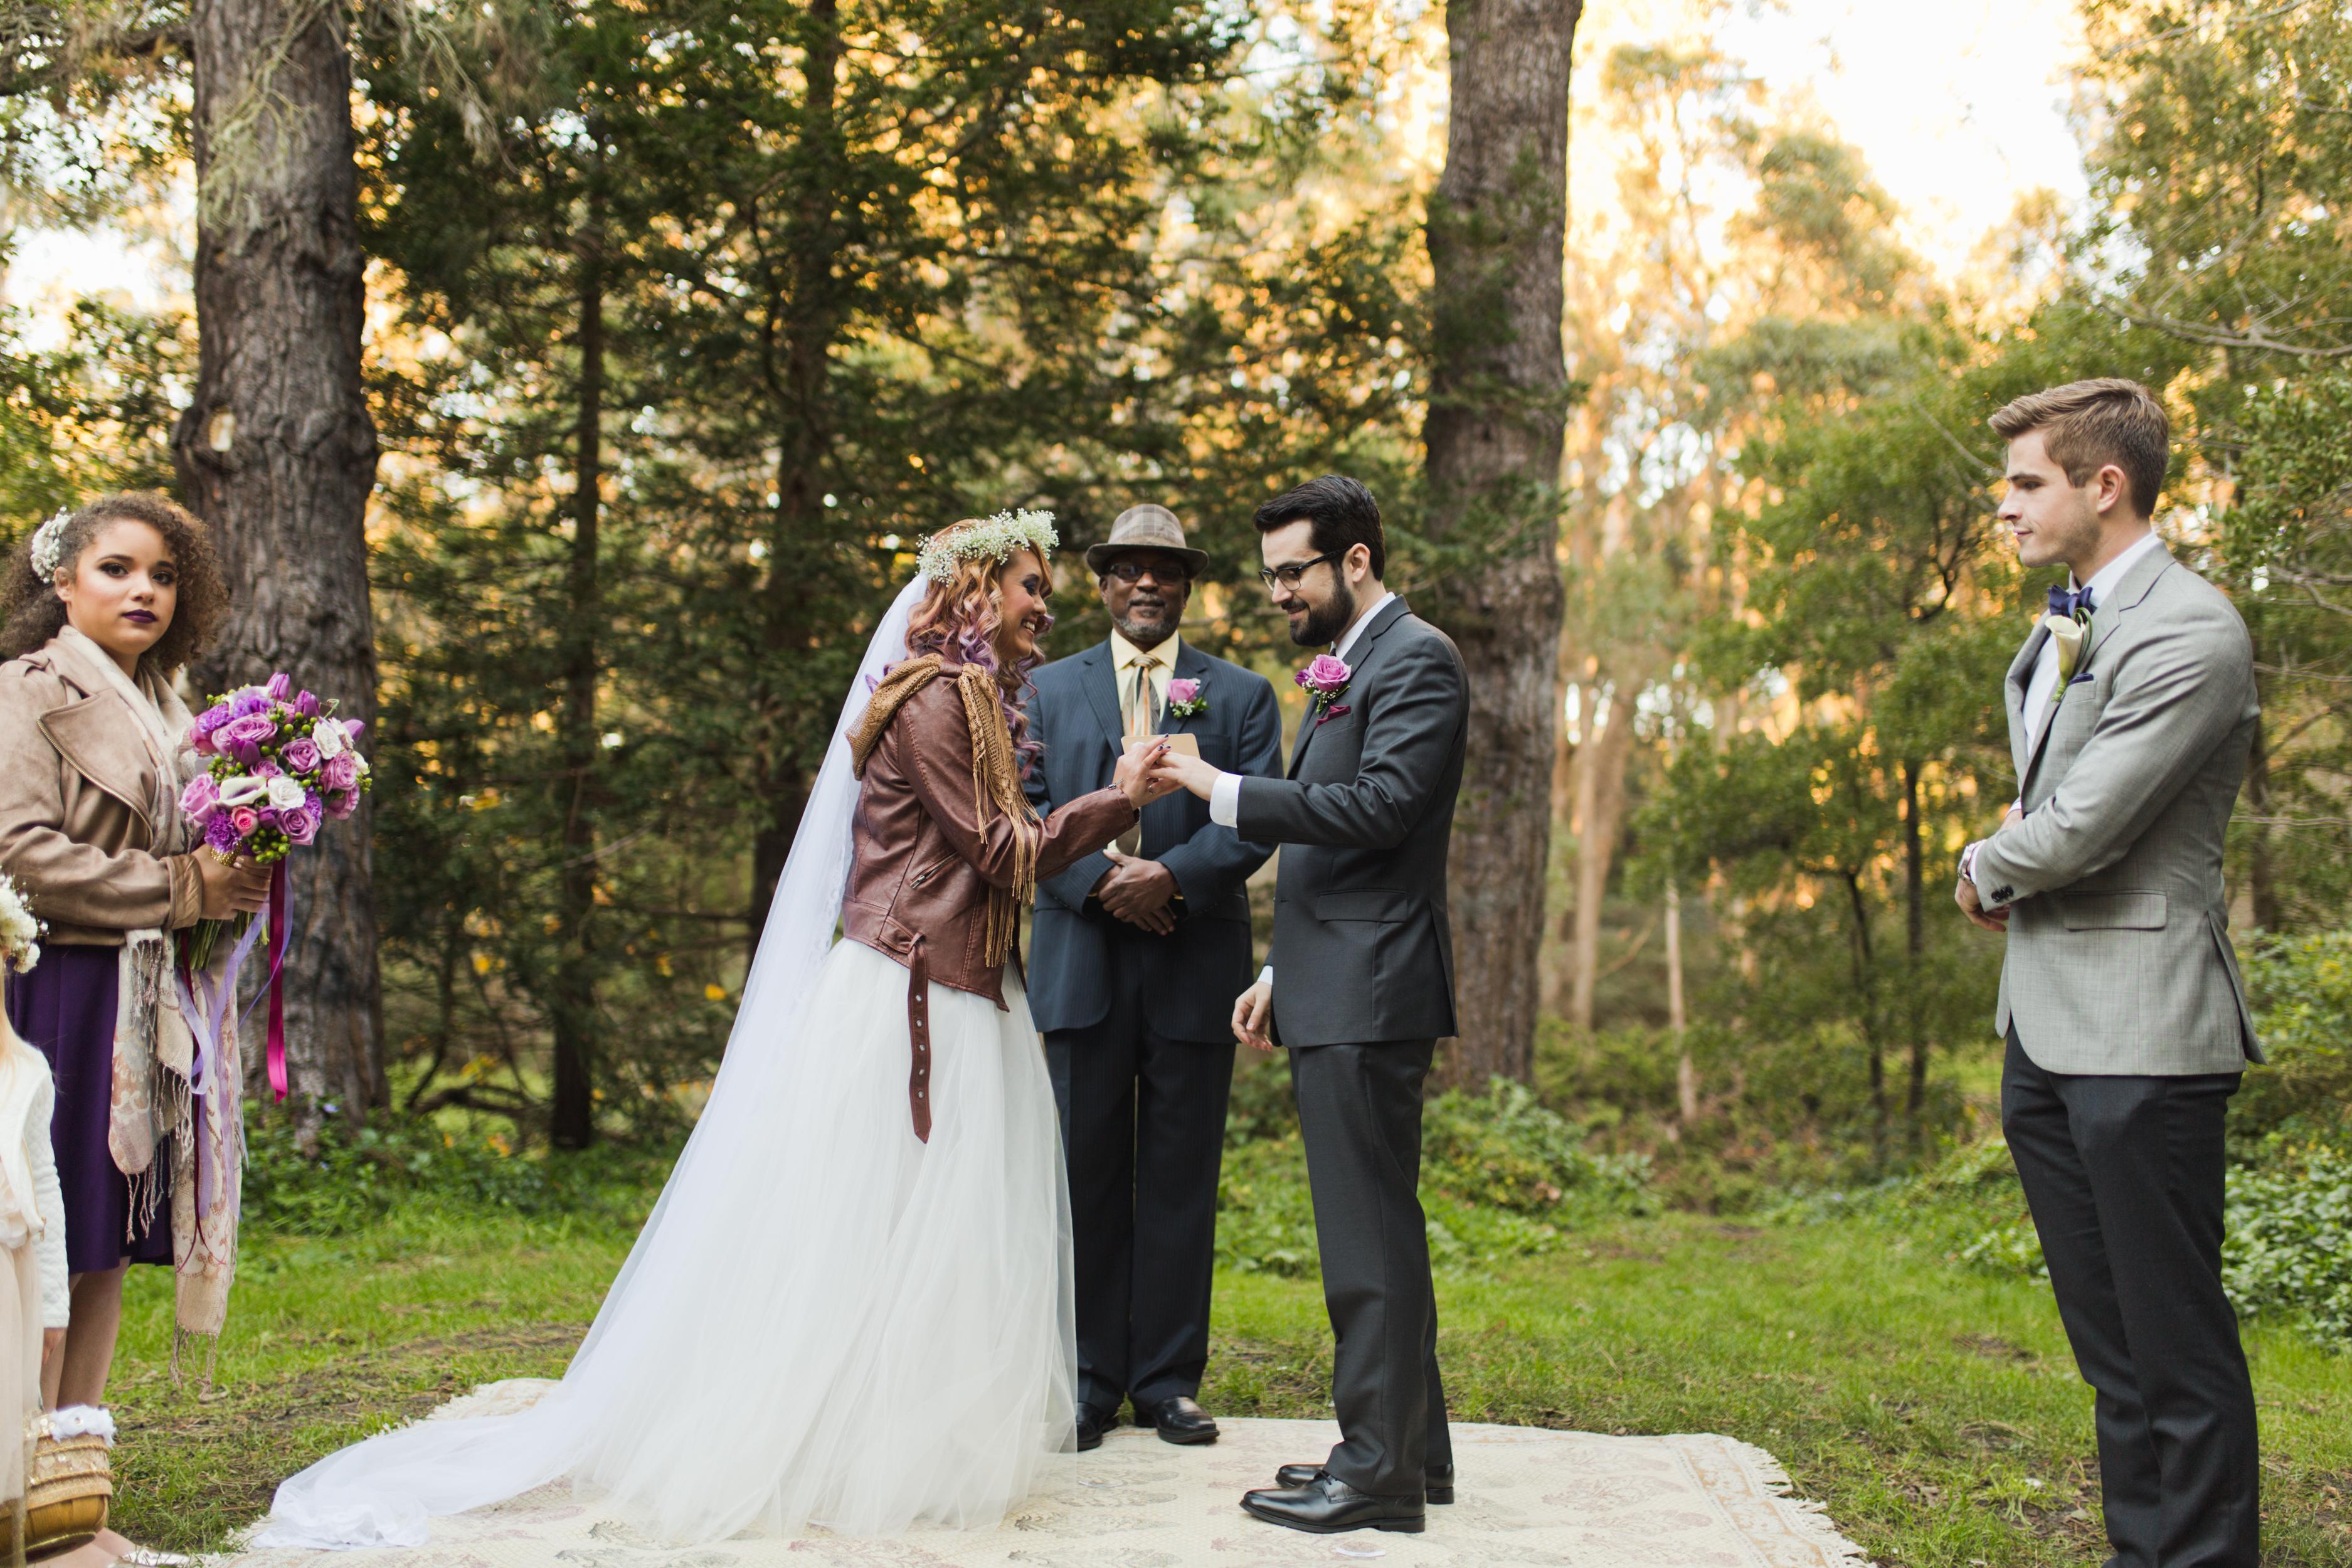 golden-gate-park-wedding-ceremony